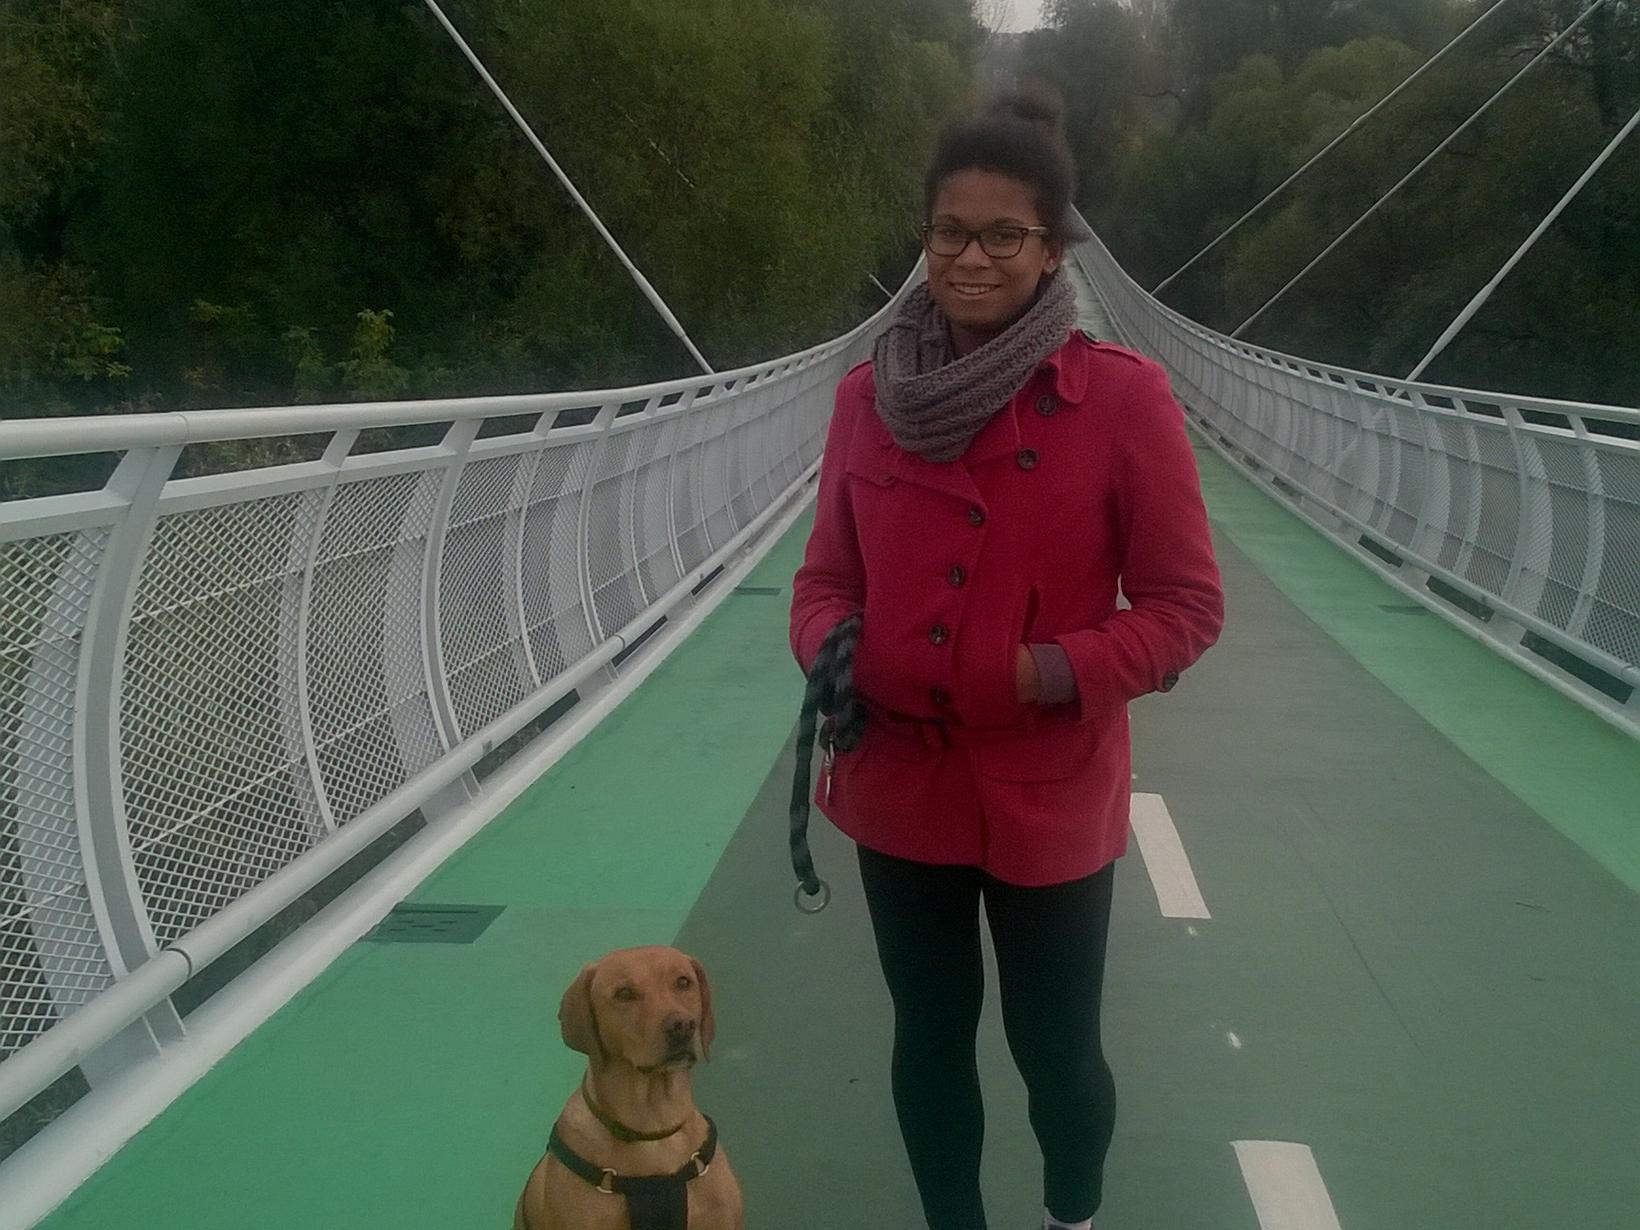 Linda from Brno, Czech Republic